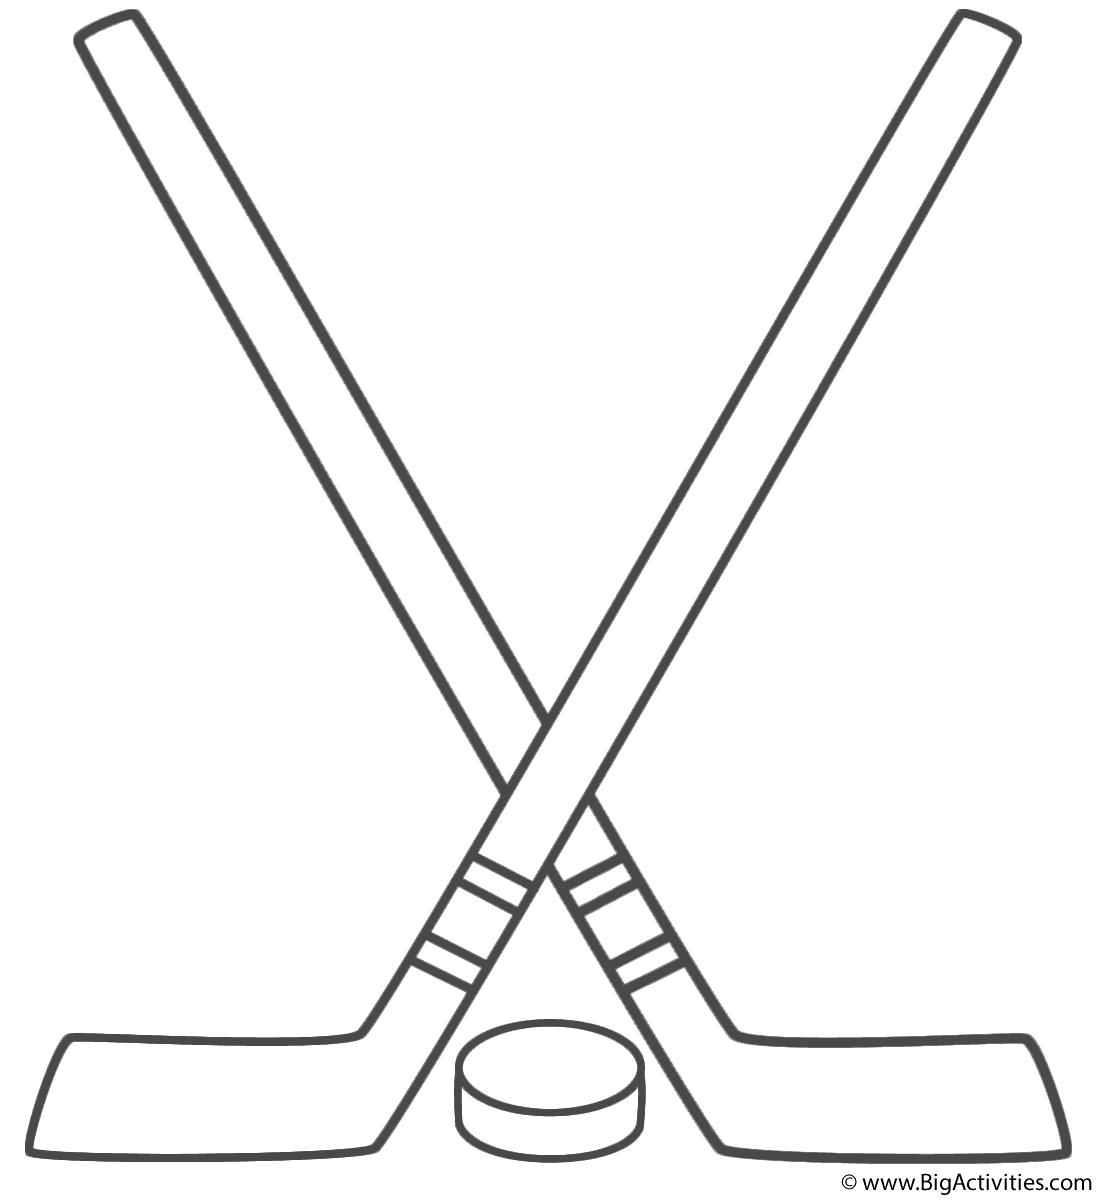 Coloring Page Hockey Stick Hockey Crafts Hockey Drawing